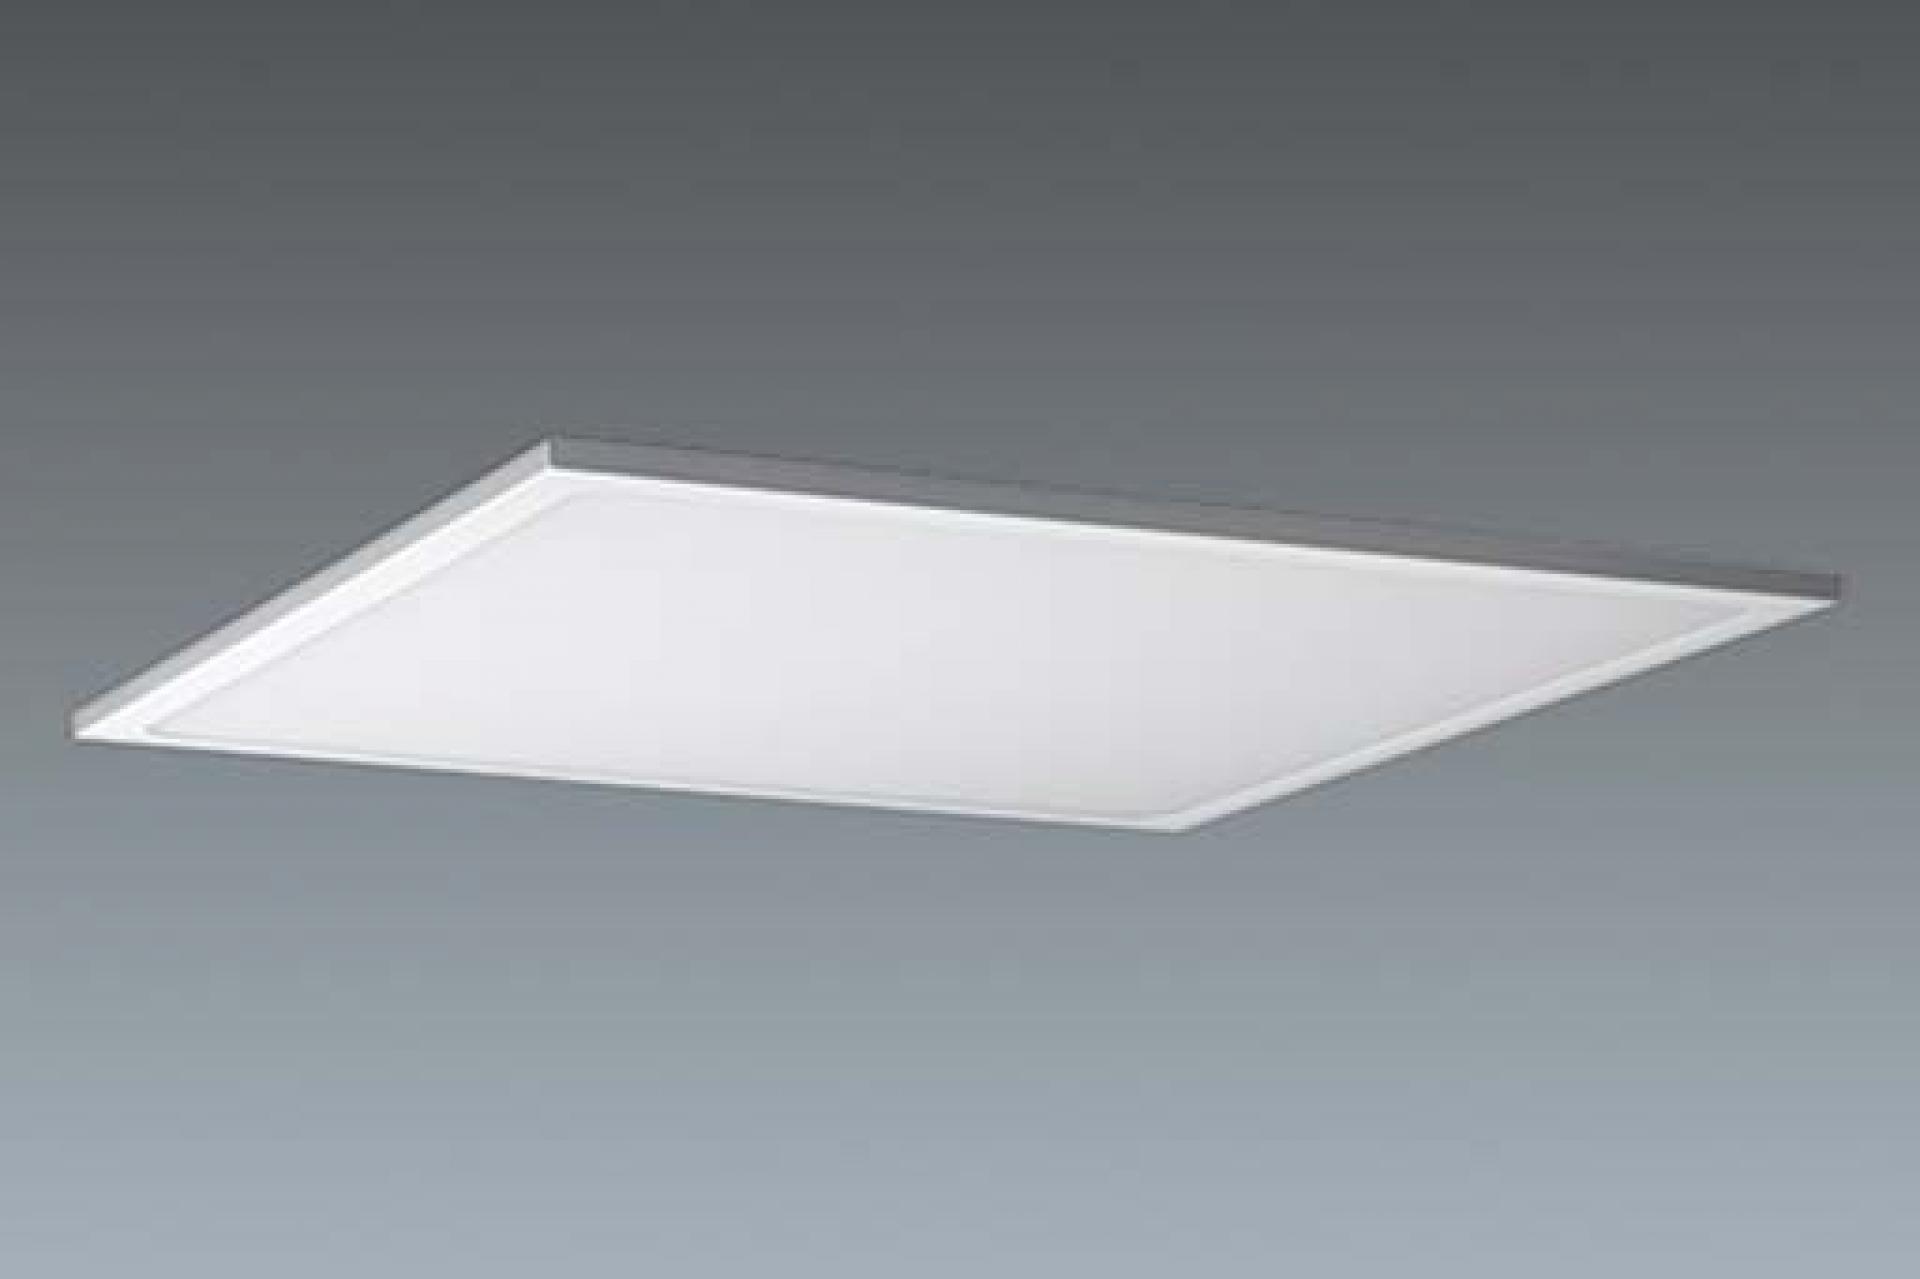 Led Lampe Flach | Dekoration Ideen